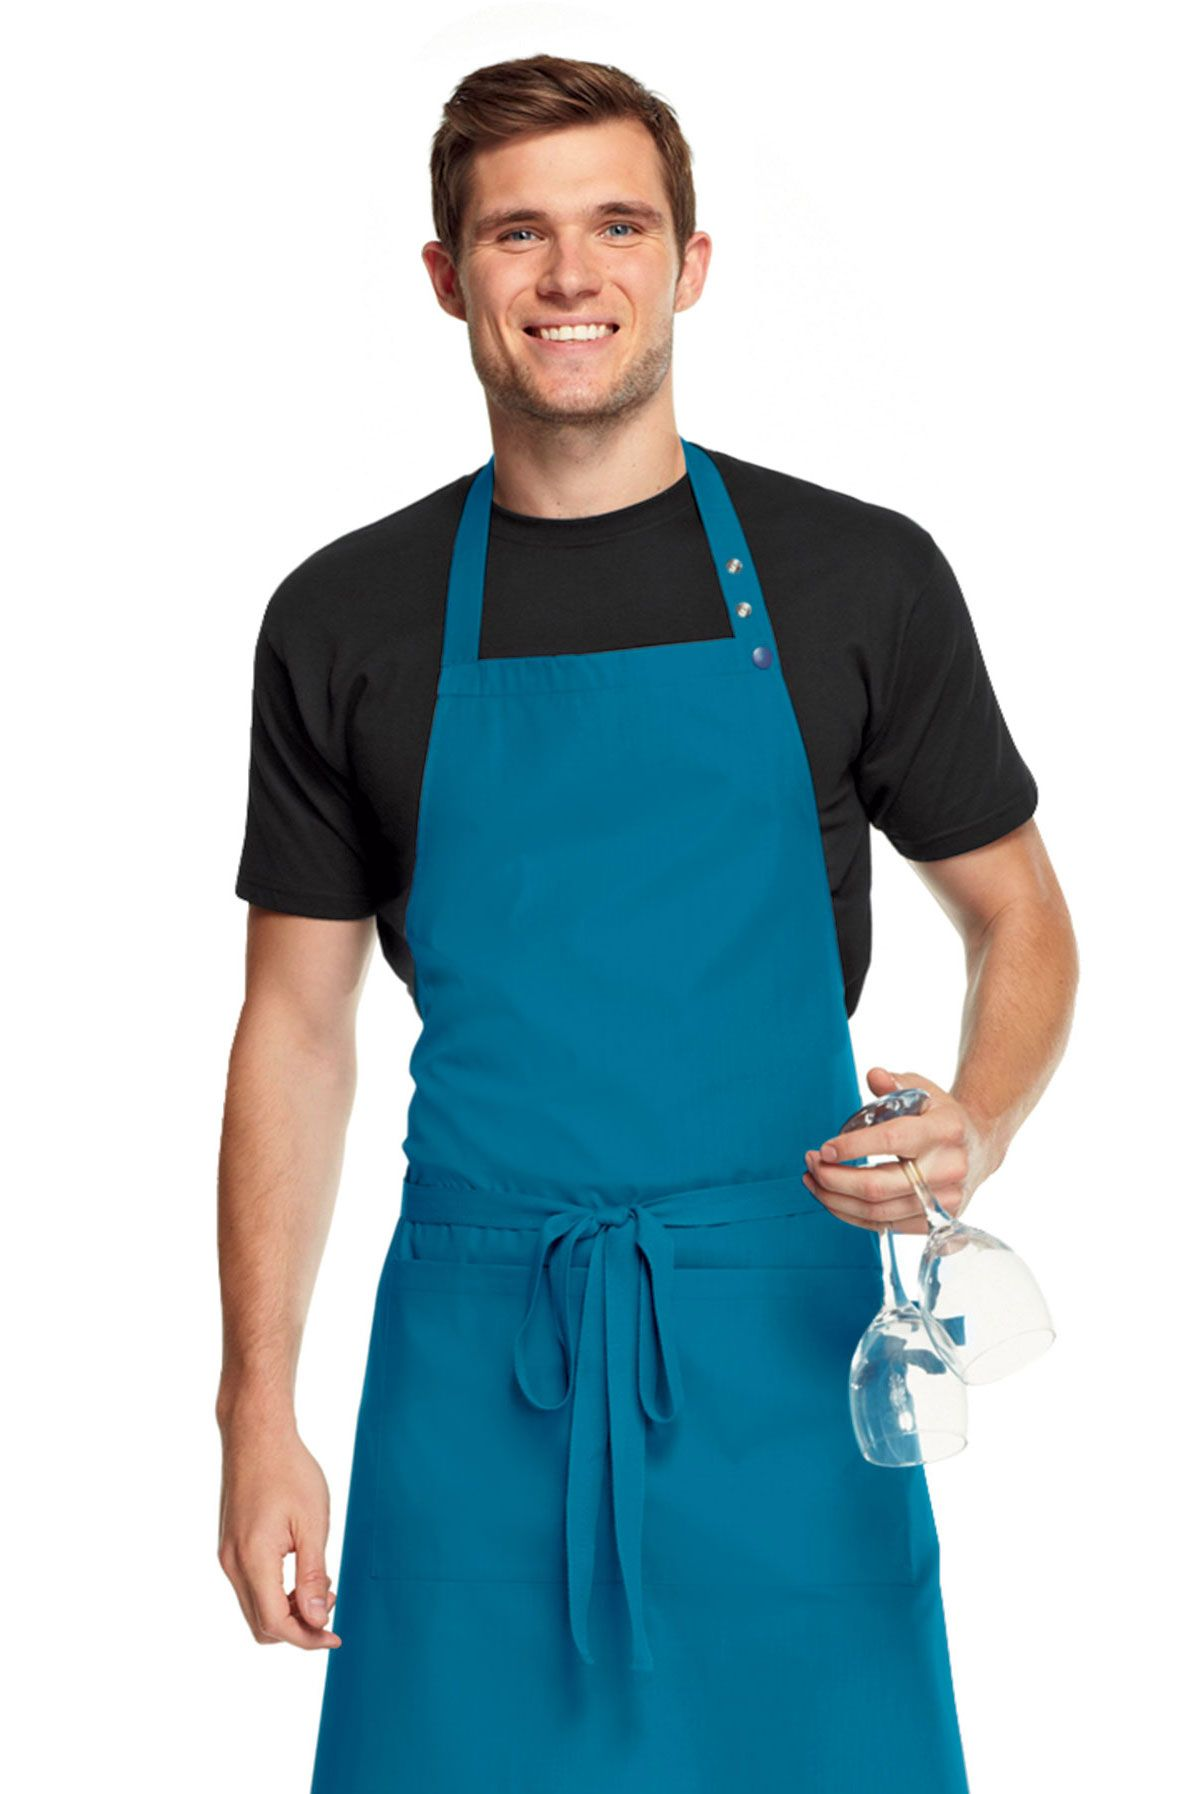 Simon Jersey teal bib apron from 6.29 // Waiter apron ...